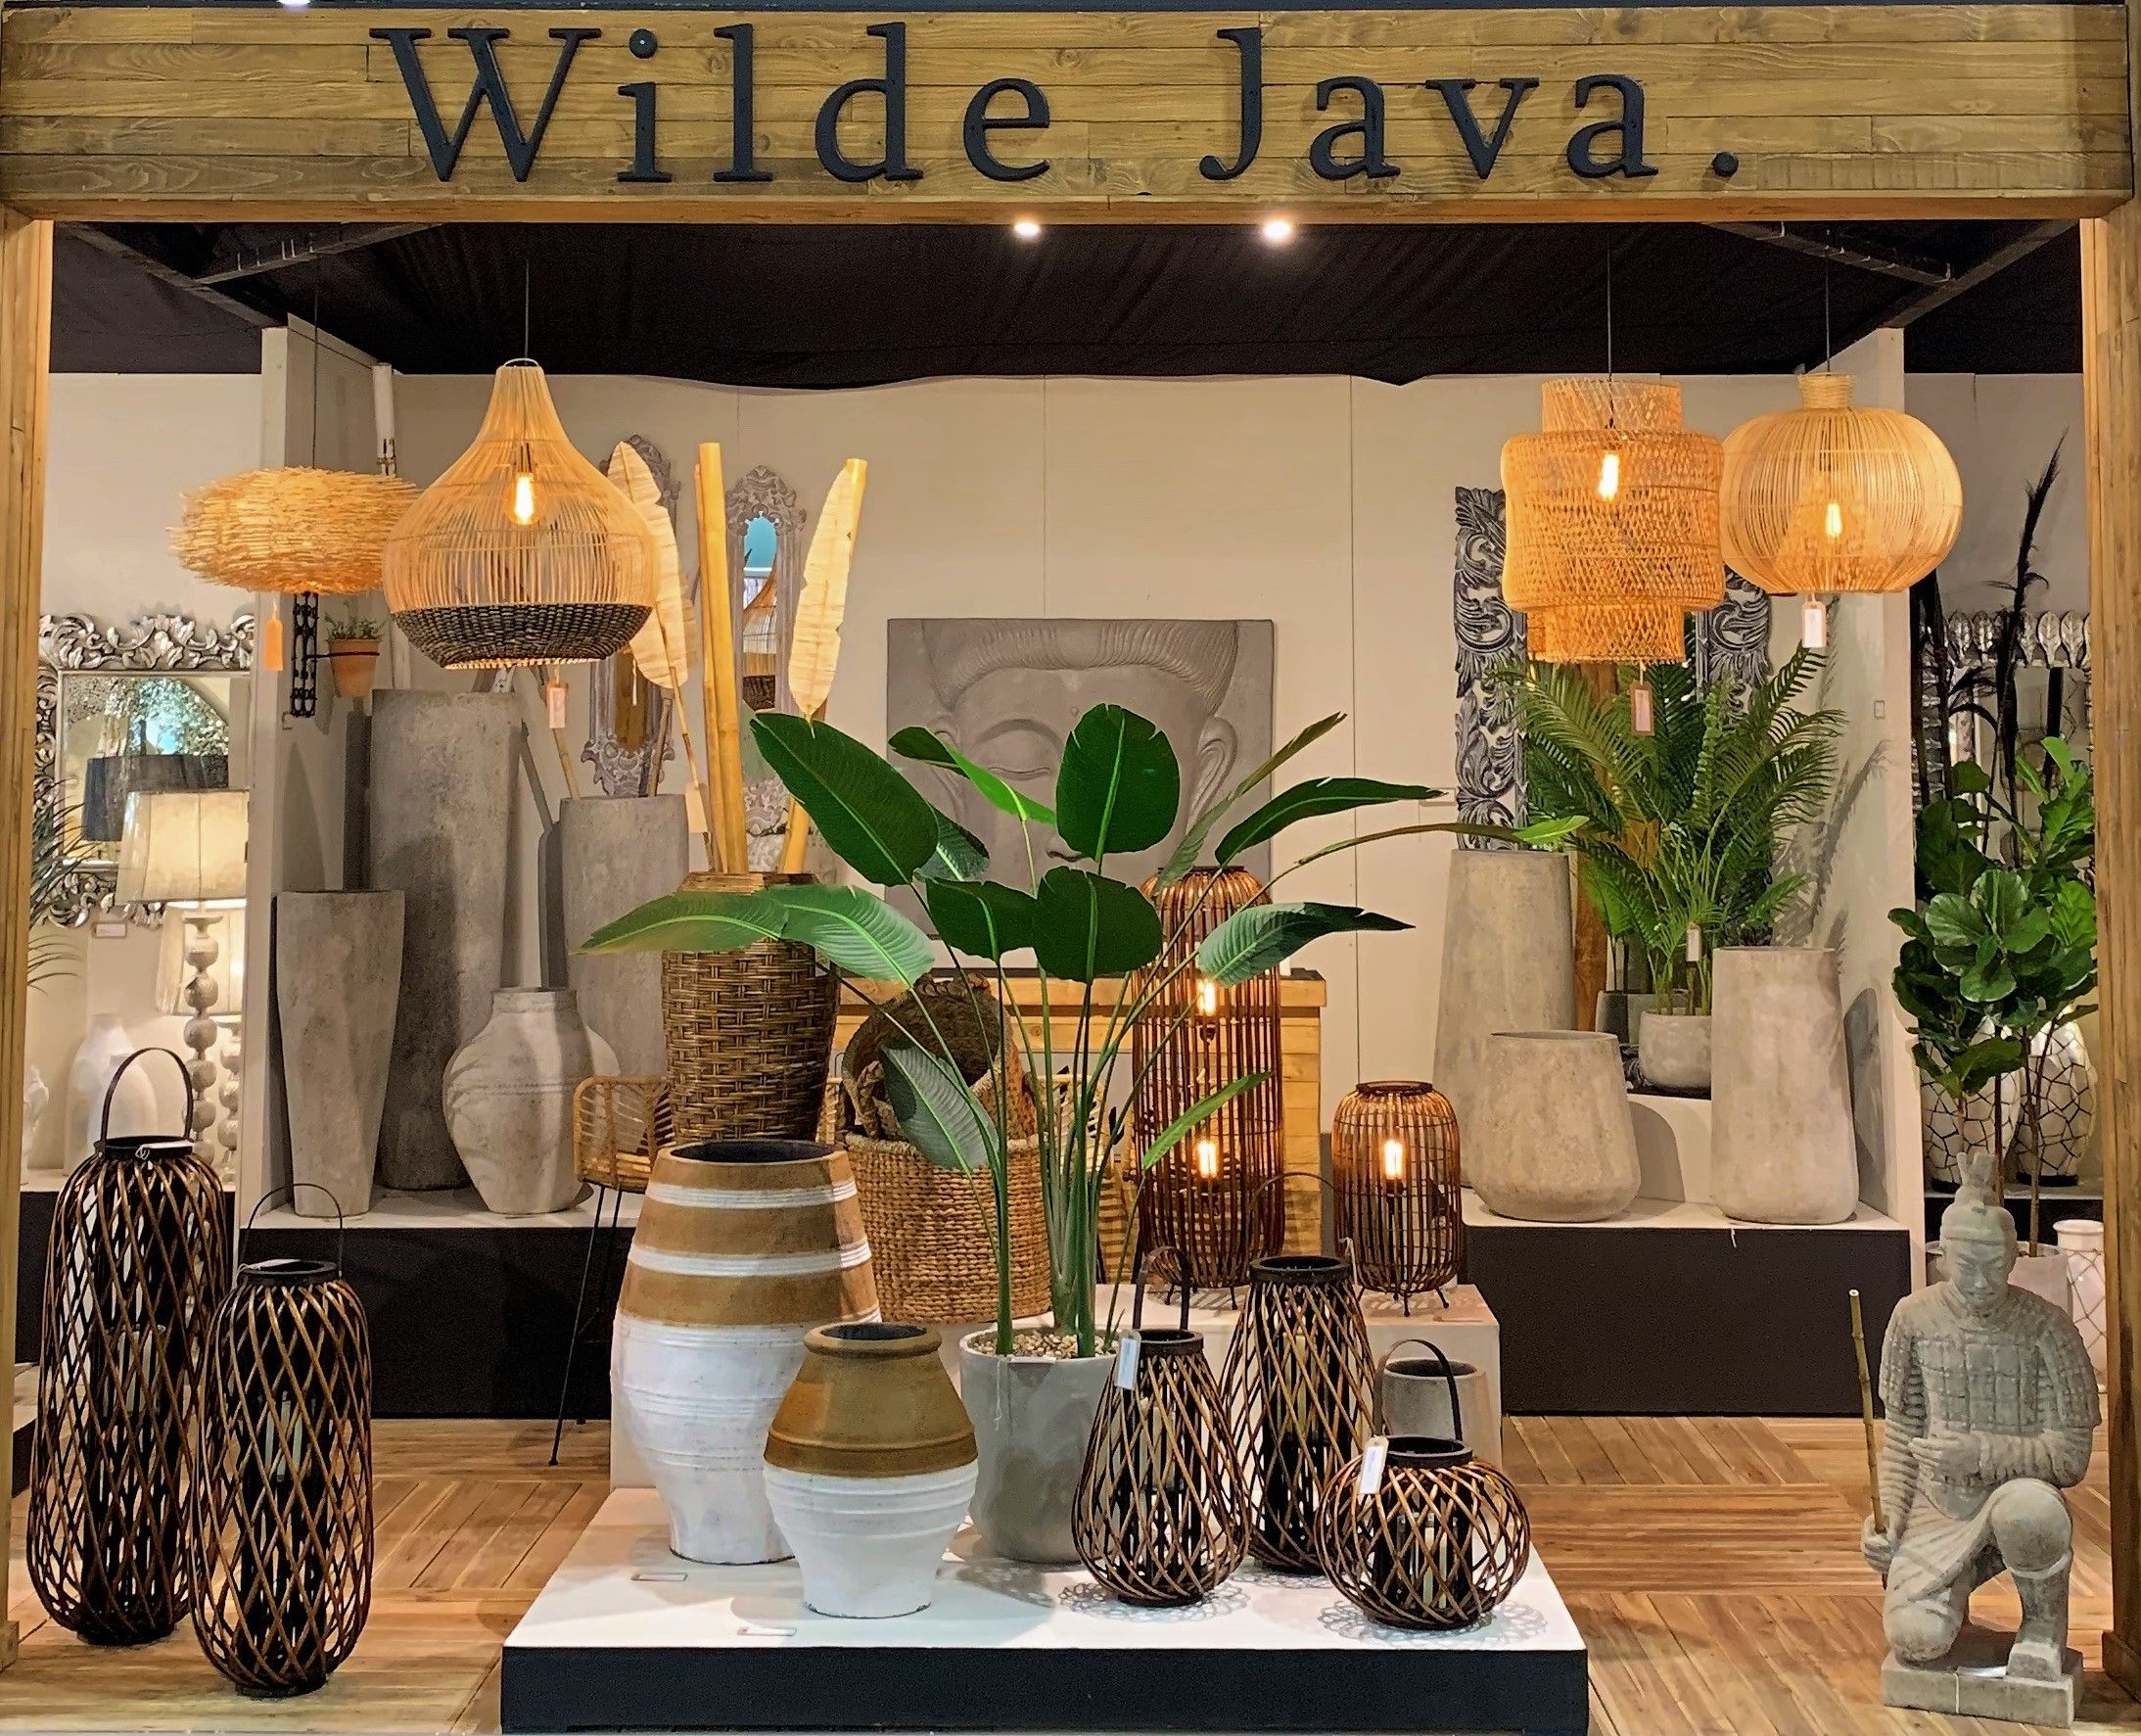 Wilde Java